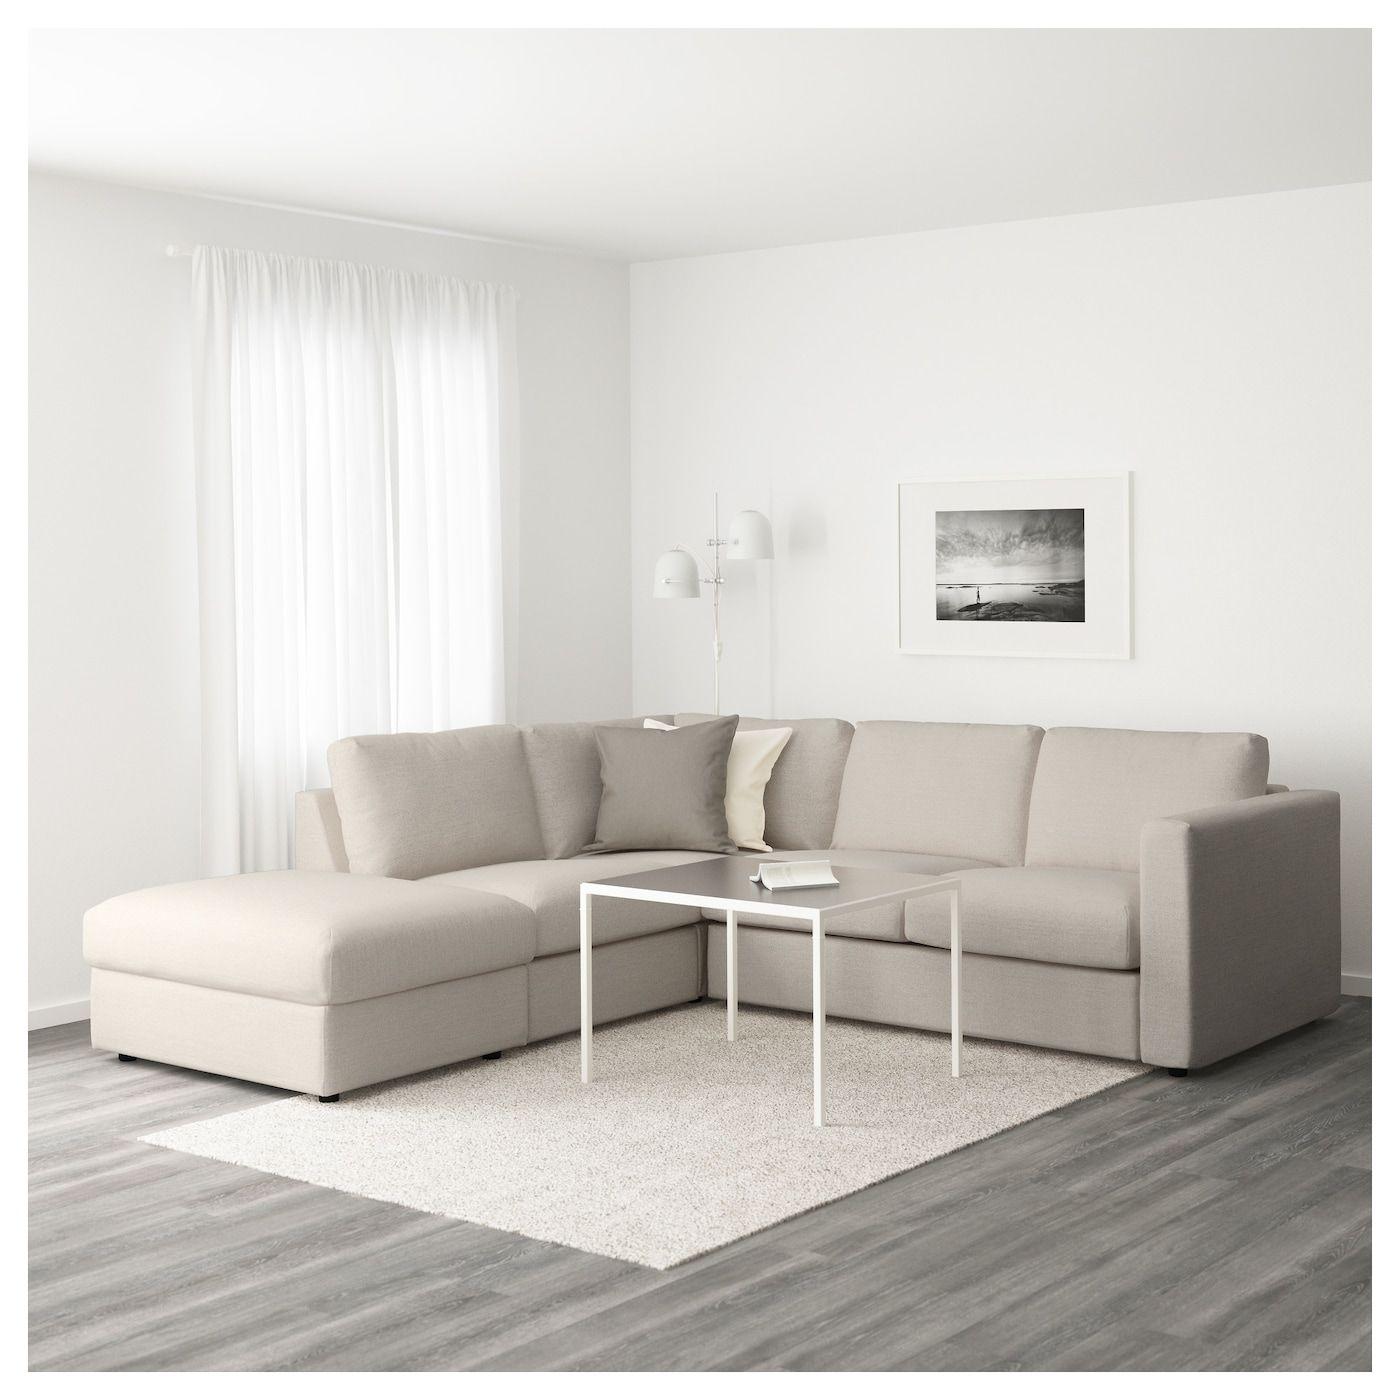 Vimle Sectional 4 Seat Corner With Open End Gunnared Beige Cozy Sofa Ikea Sofa Ikea Vimle